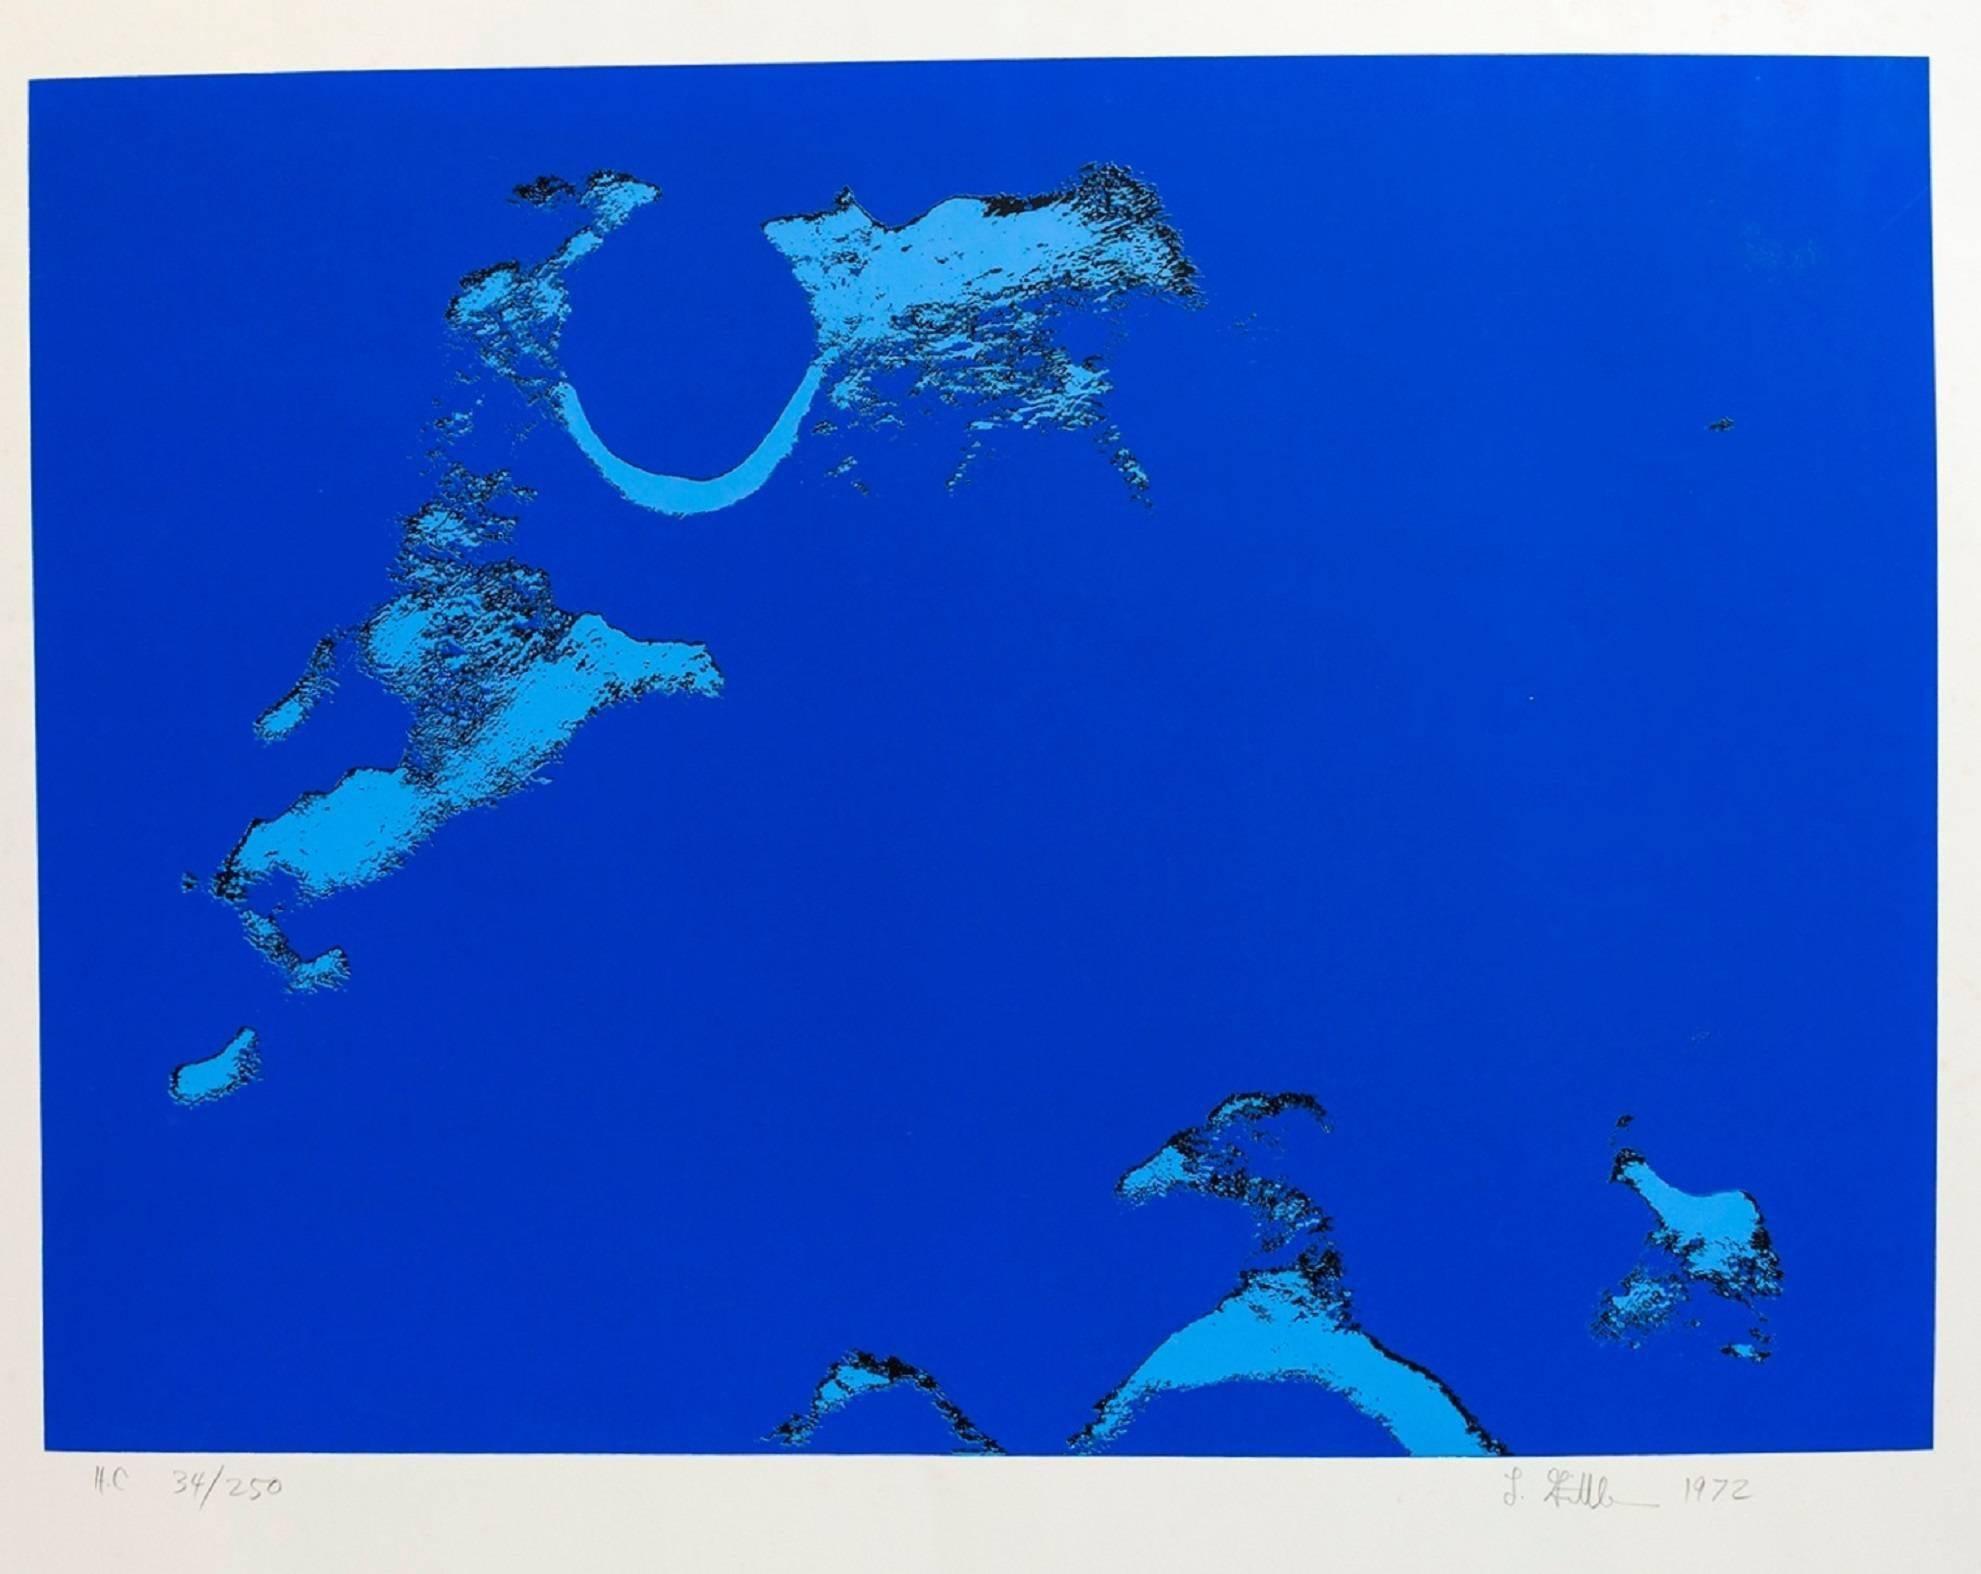 Lunar Landscape Abstract Signed Numbered Screenprint Blue